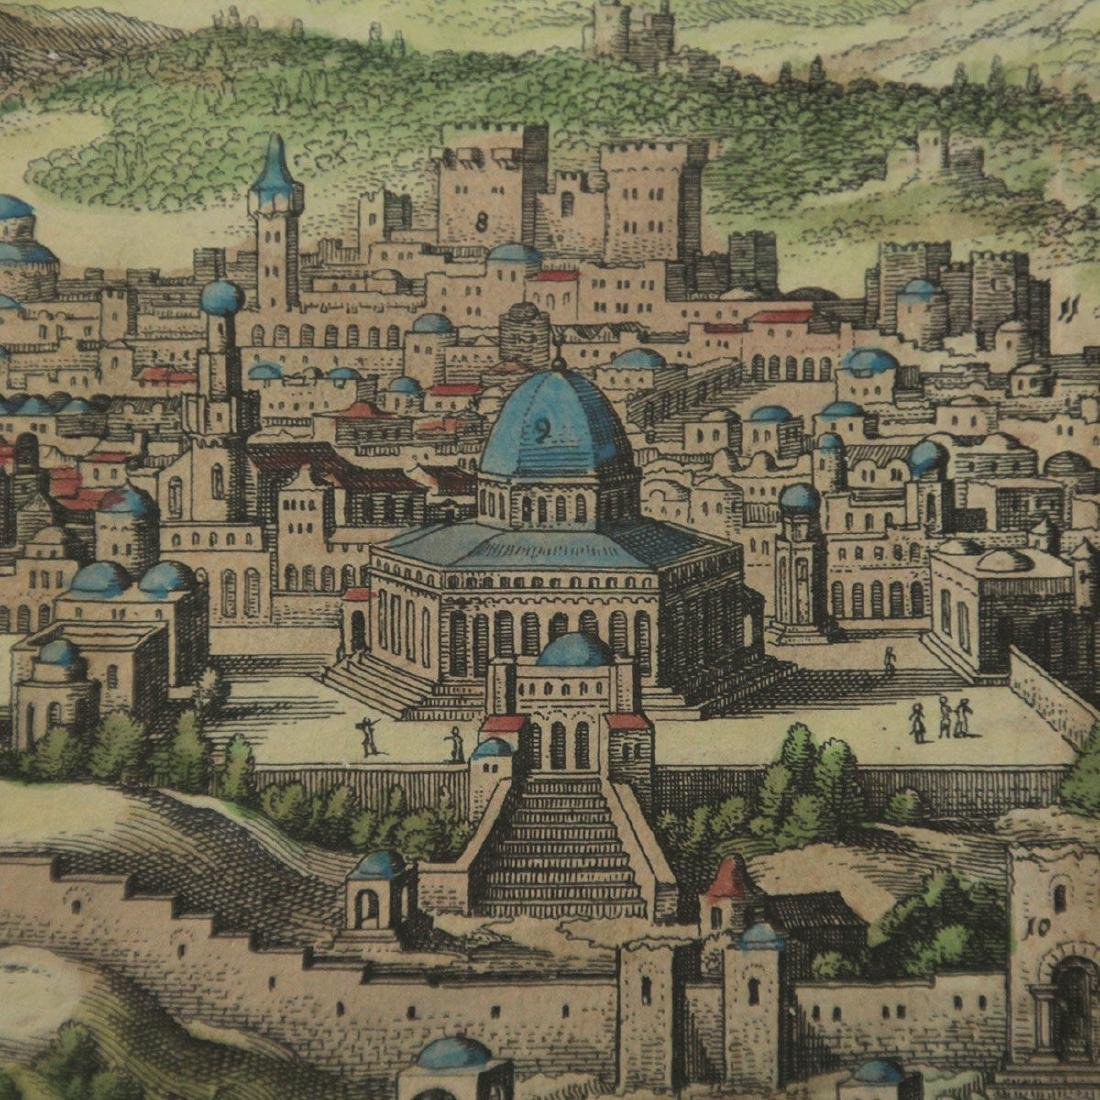 Ierusalem - Panoramic Map View of Jerusalem, Probably - 4